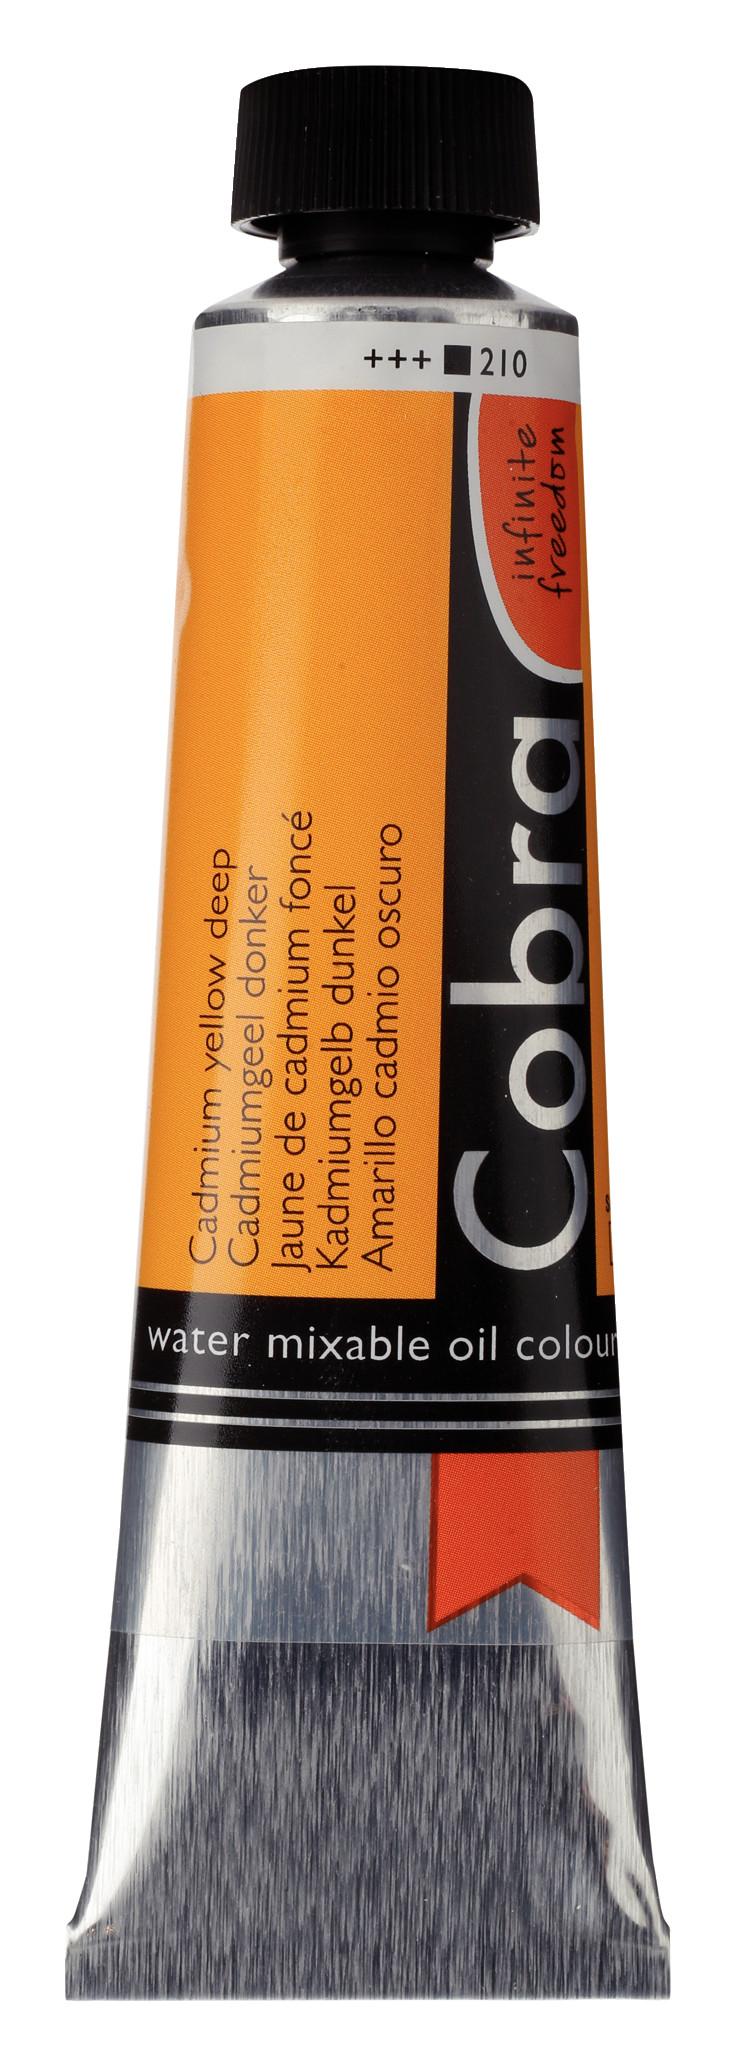 Cobra Artist Water Mixable Oil Colour Tube 40 ml Cadmium yellow deep 210